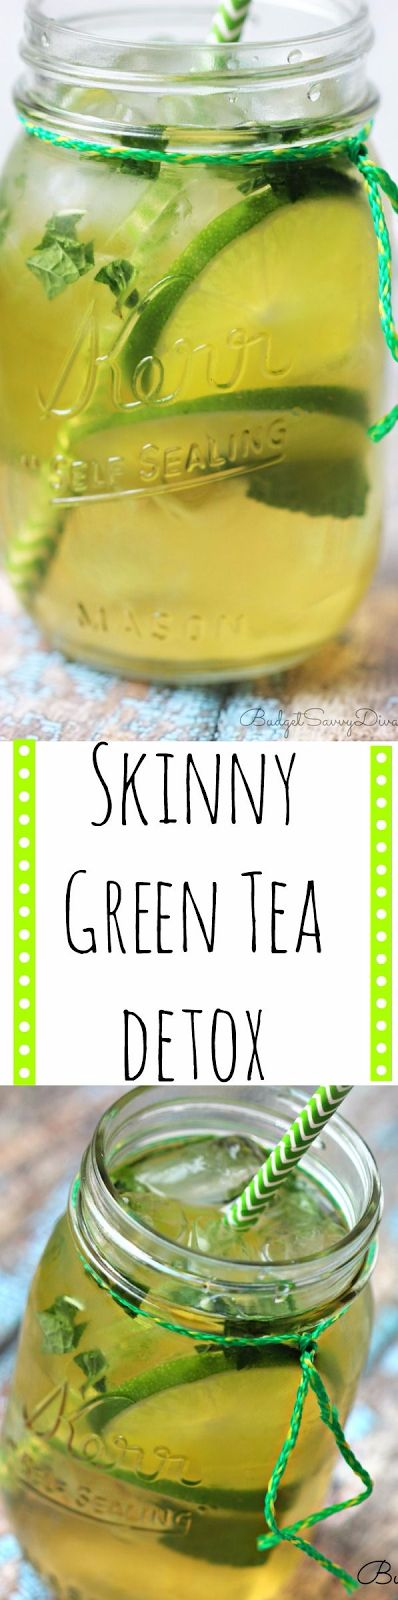 Skinny Green Tea Detox Recipe